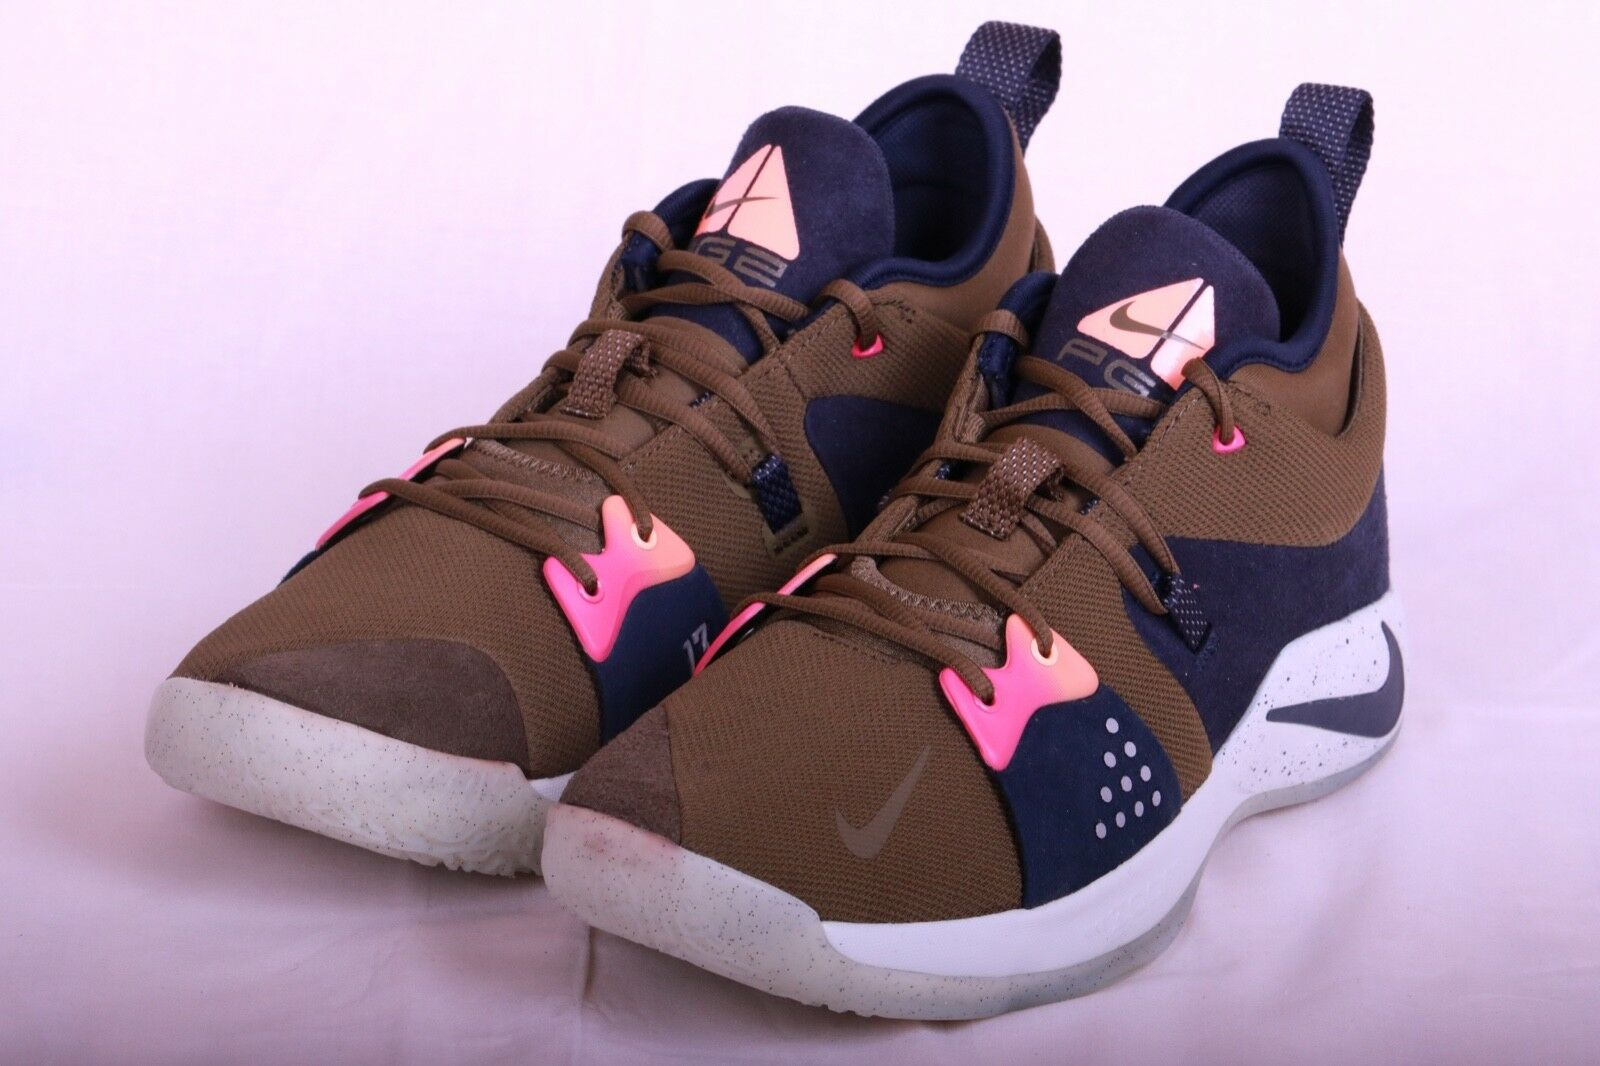 Nike lebron sz 11 azzurre, sz lebron 13   xi 12 12,5 cemento francese air max 19ec0a